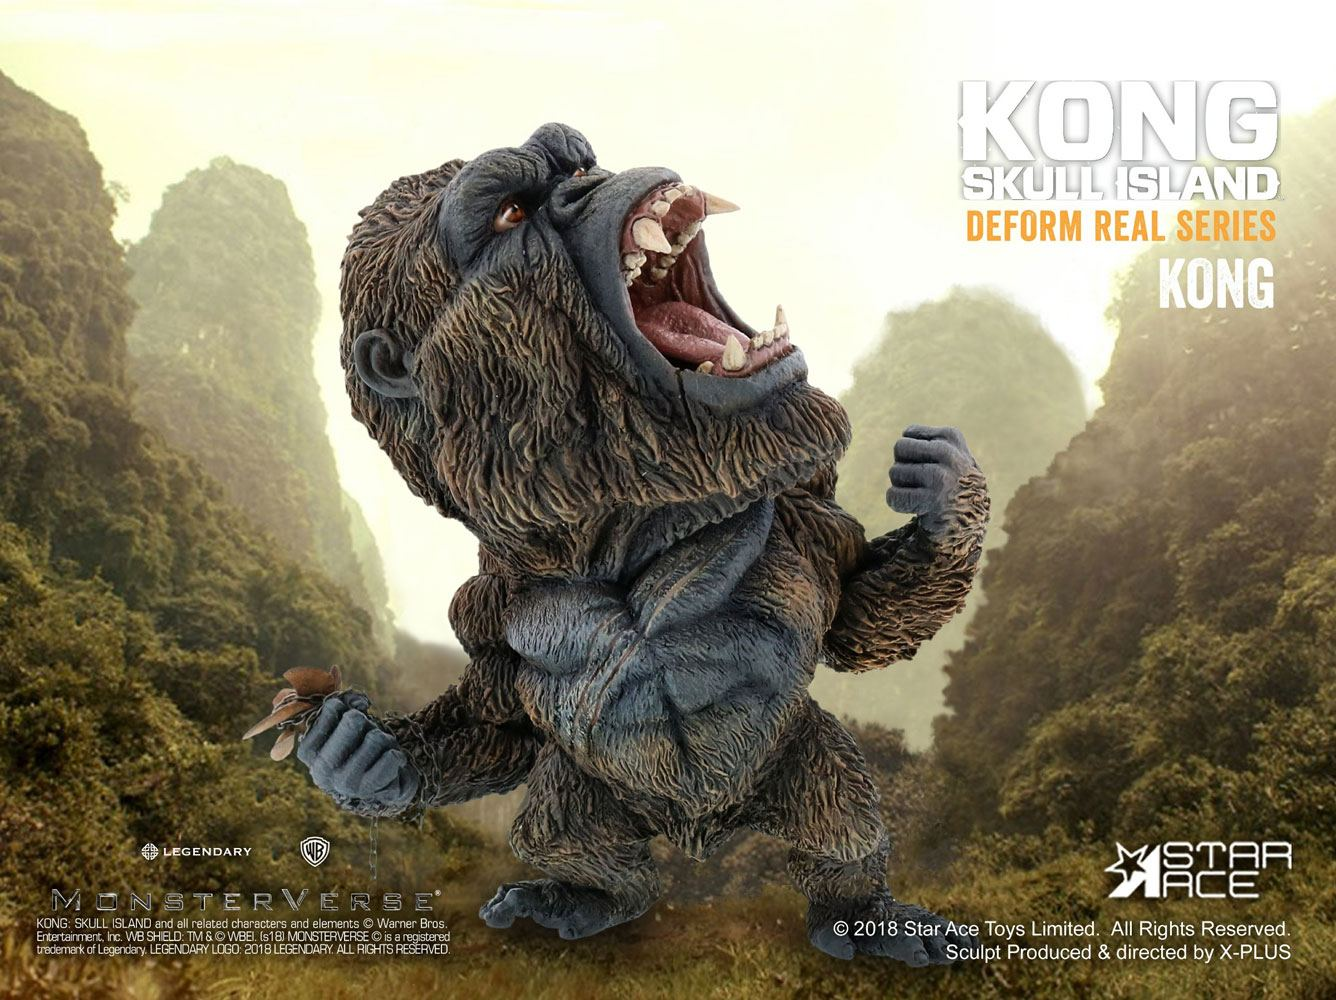 Kong Skull Island Deform Real Series Soft Vinyl Statue Kong 15 cm